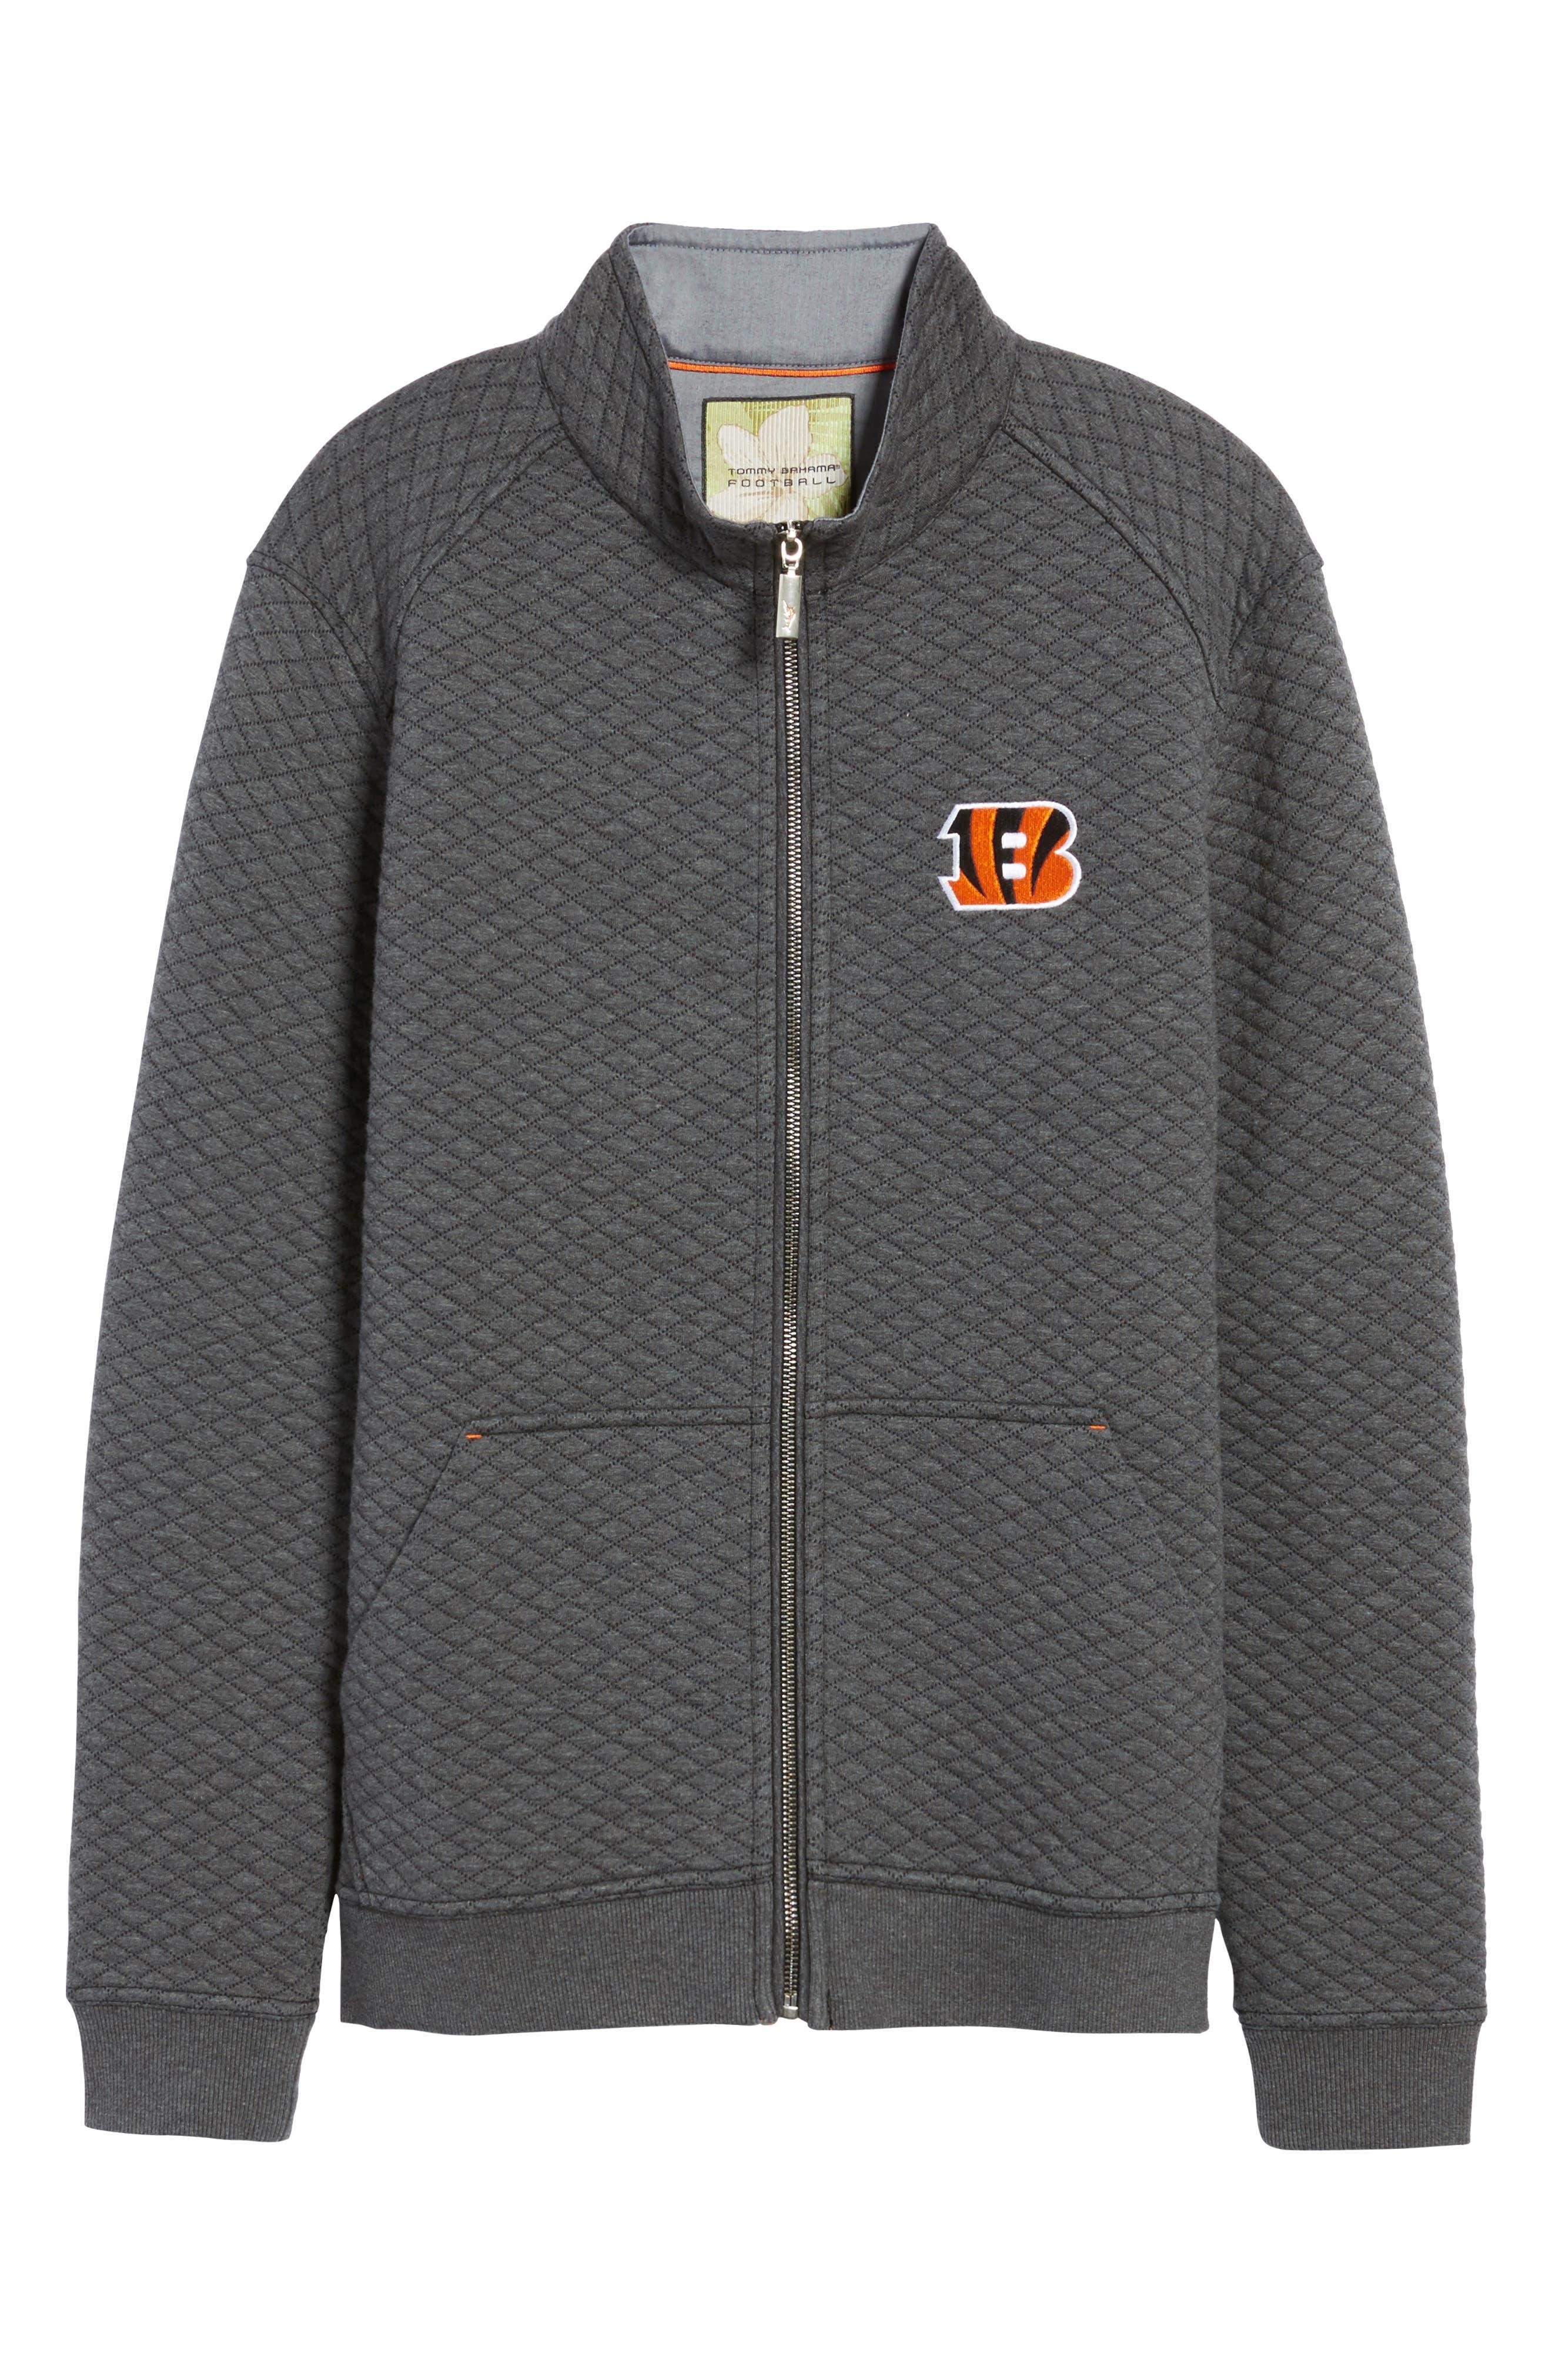 NFL Quiltessential Full Zip Sweatshirt,                             Alternate thumbnail 159, color,